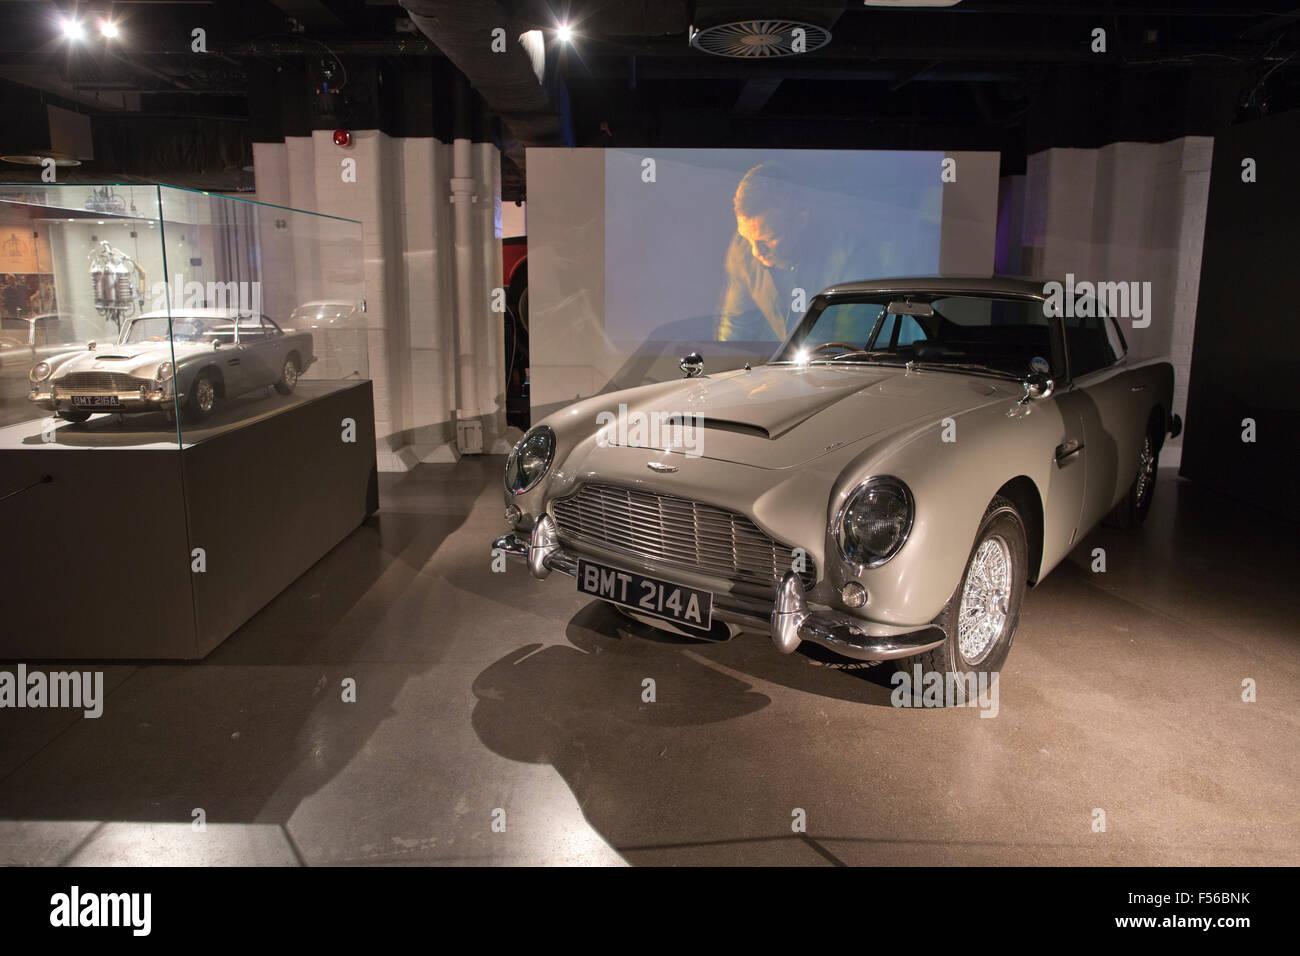 Aston Martin Db5 Used In The James Bond 2006 Casino Royale Film Stock Photo Alamy